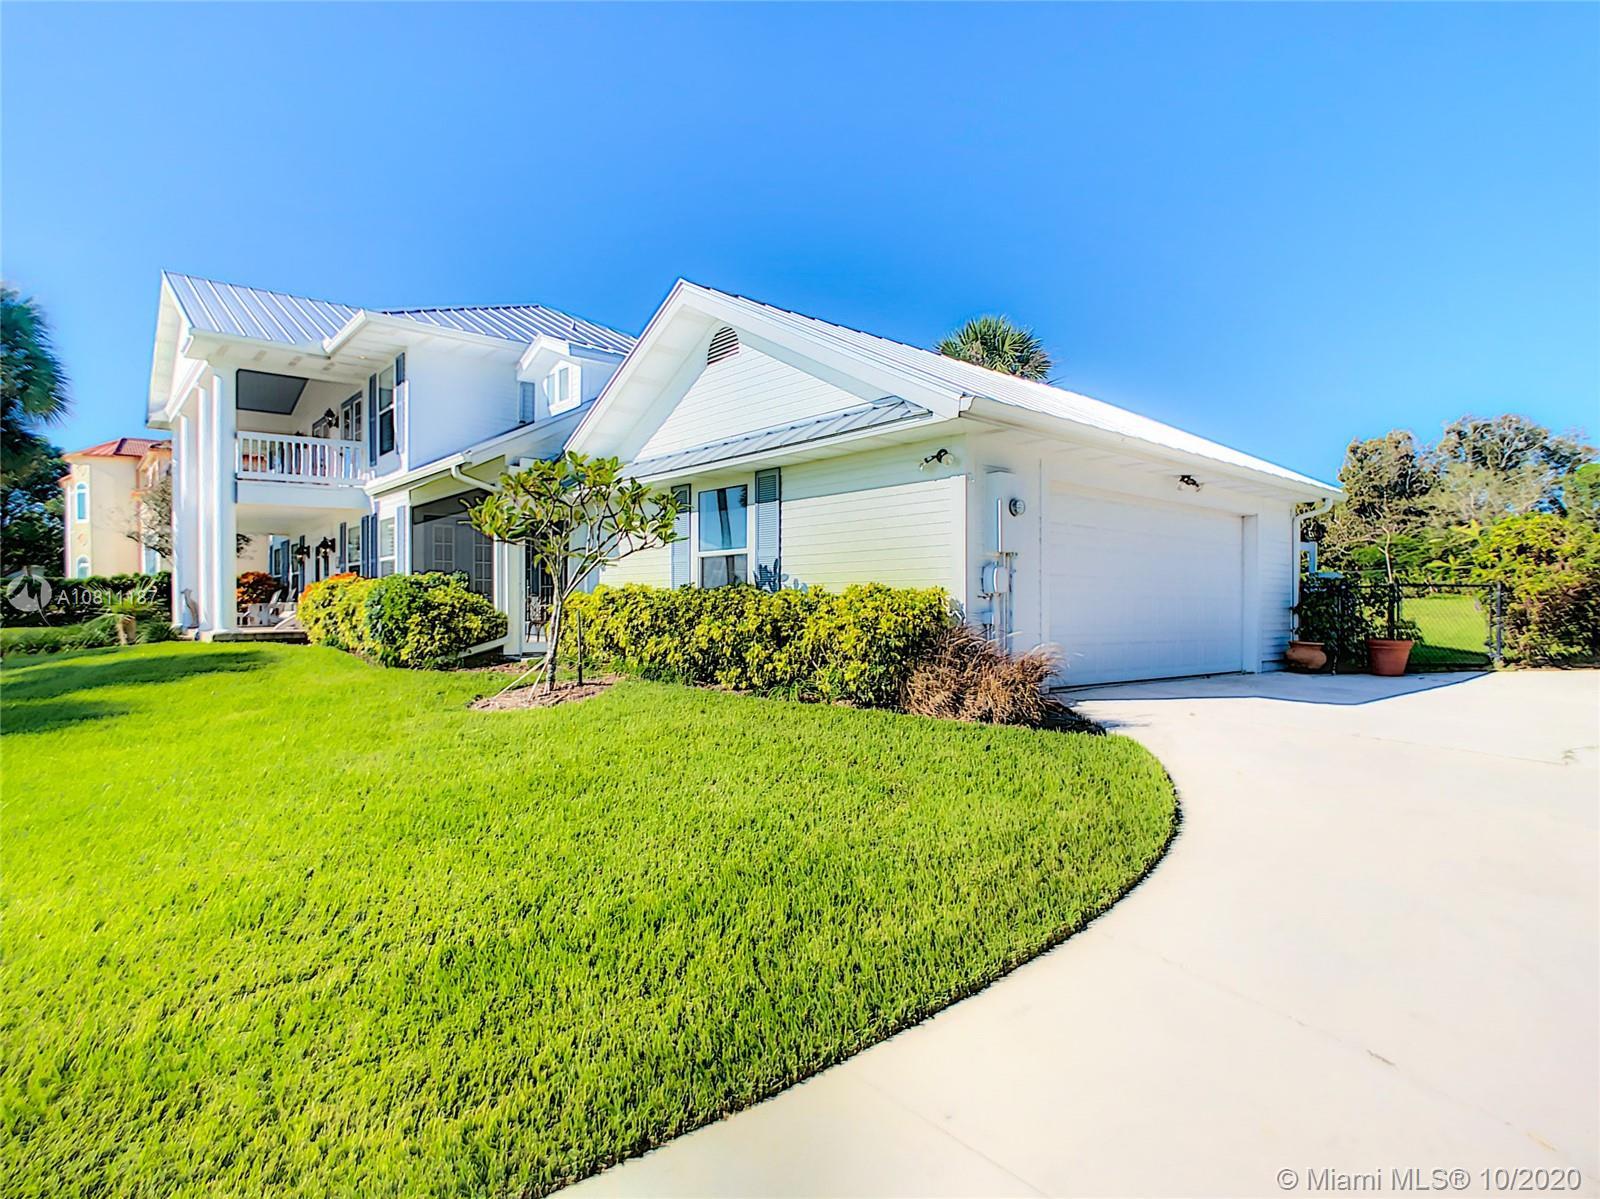 3021 S S Indian River Drive, Fort Pierce, FL 34982